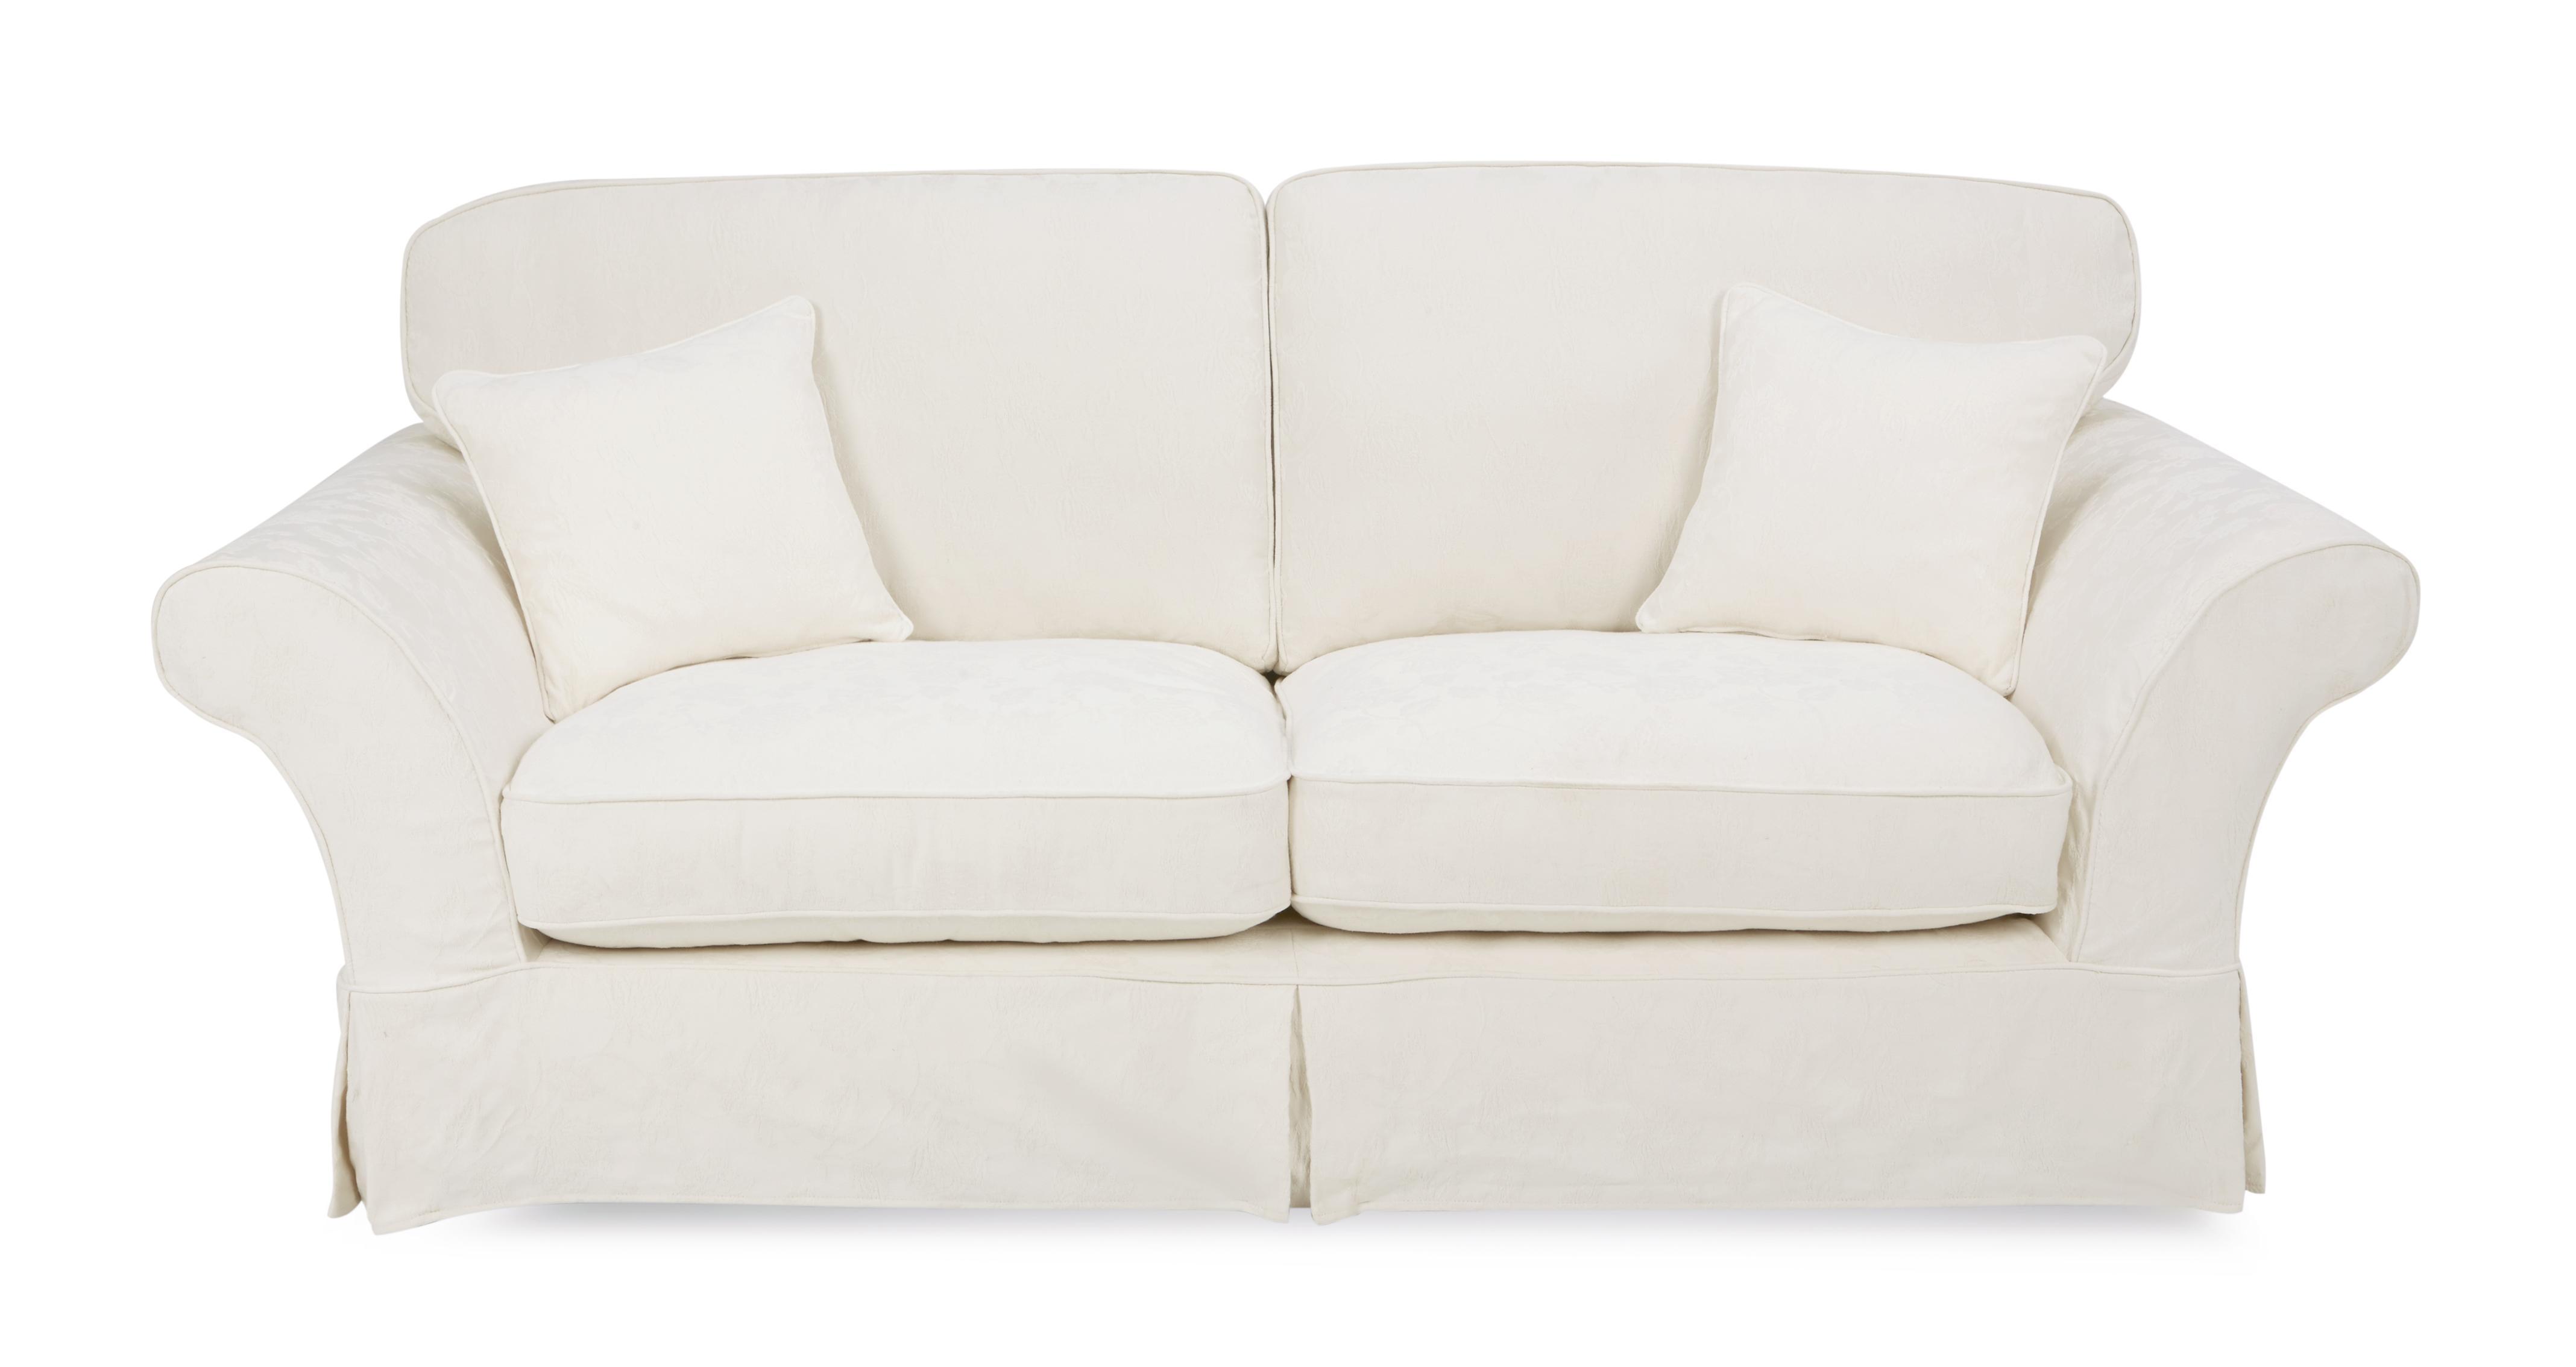 rosa 3 seater formal back deluxe sofabed dfs. Black Bedroom Furniture Sets. Home Design Ideas